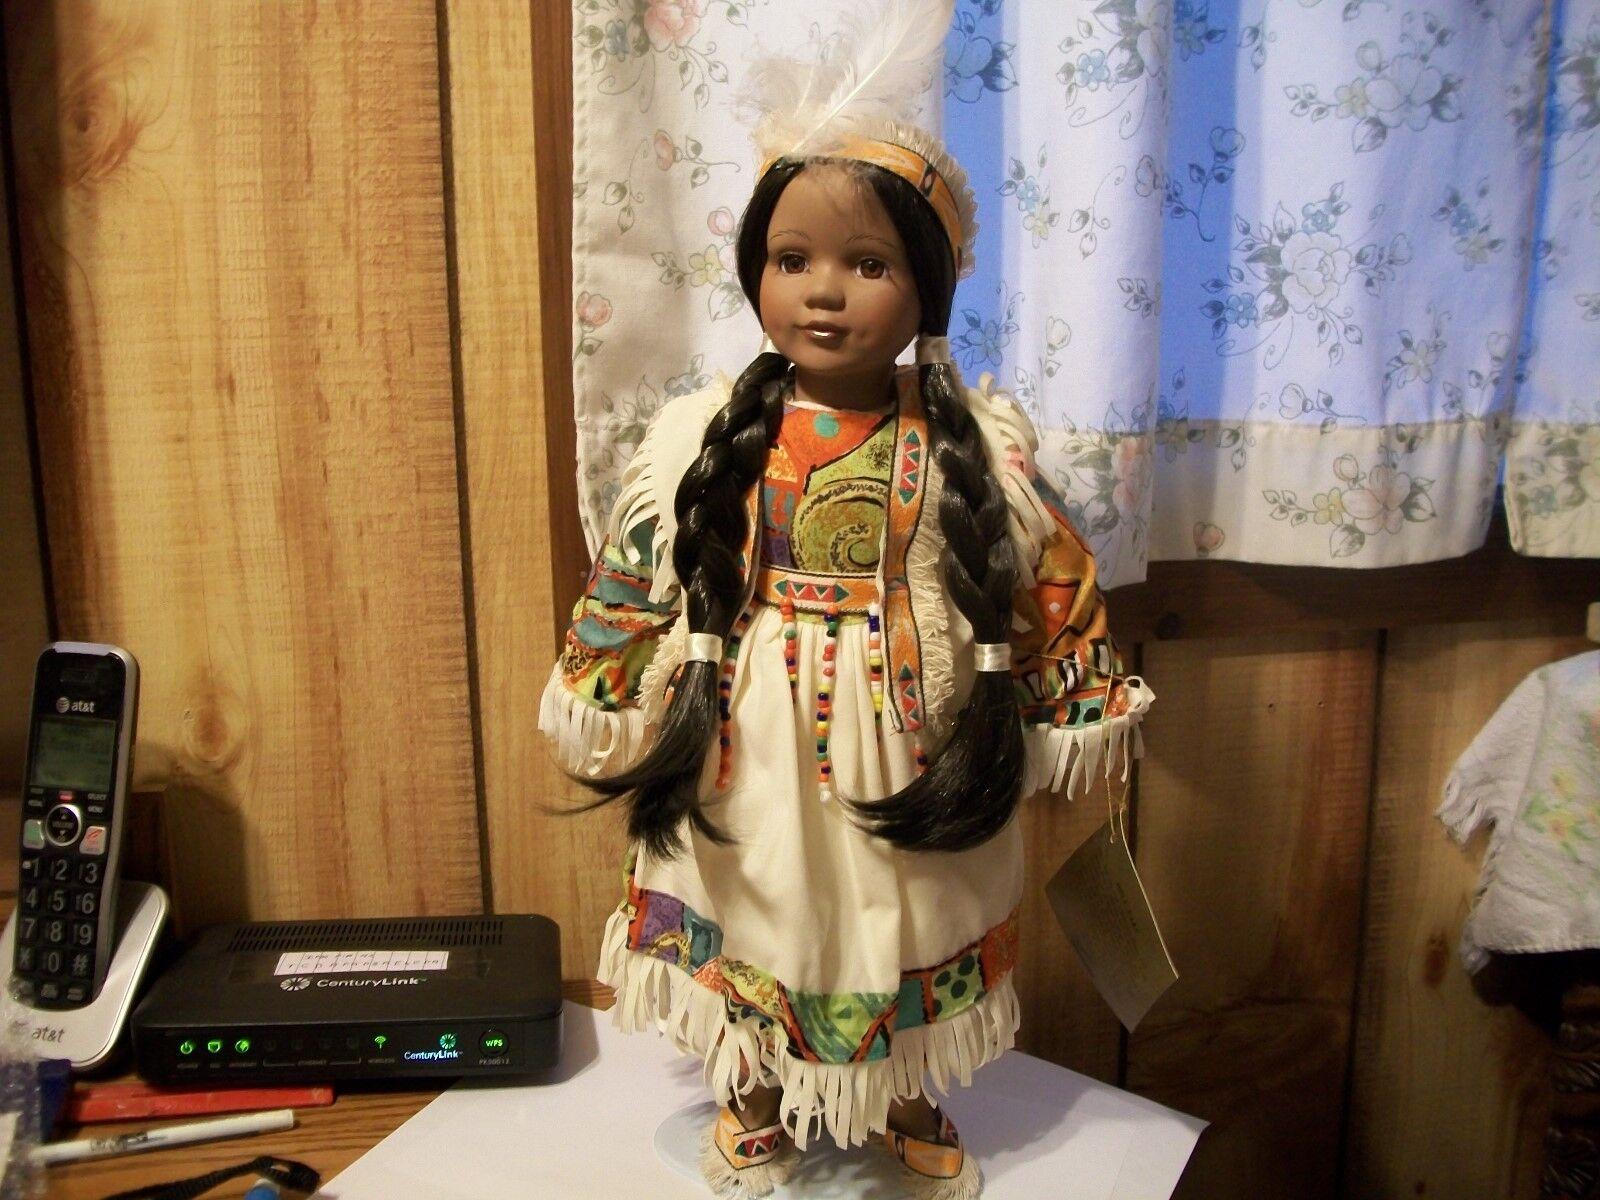 16  Seymour Mann connisseur indio muñeca con soporte de metal-Hermoso